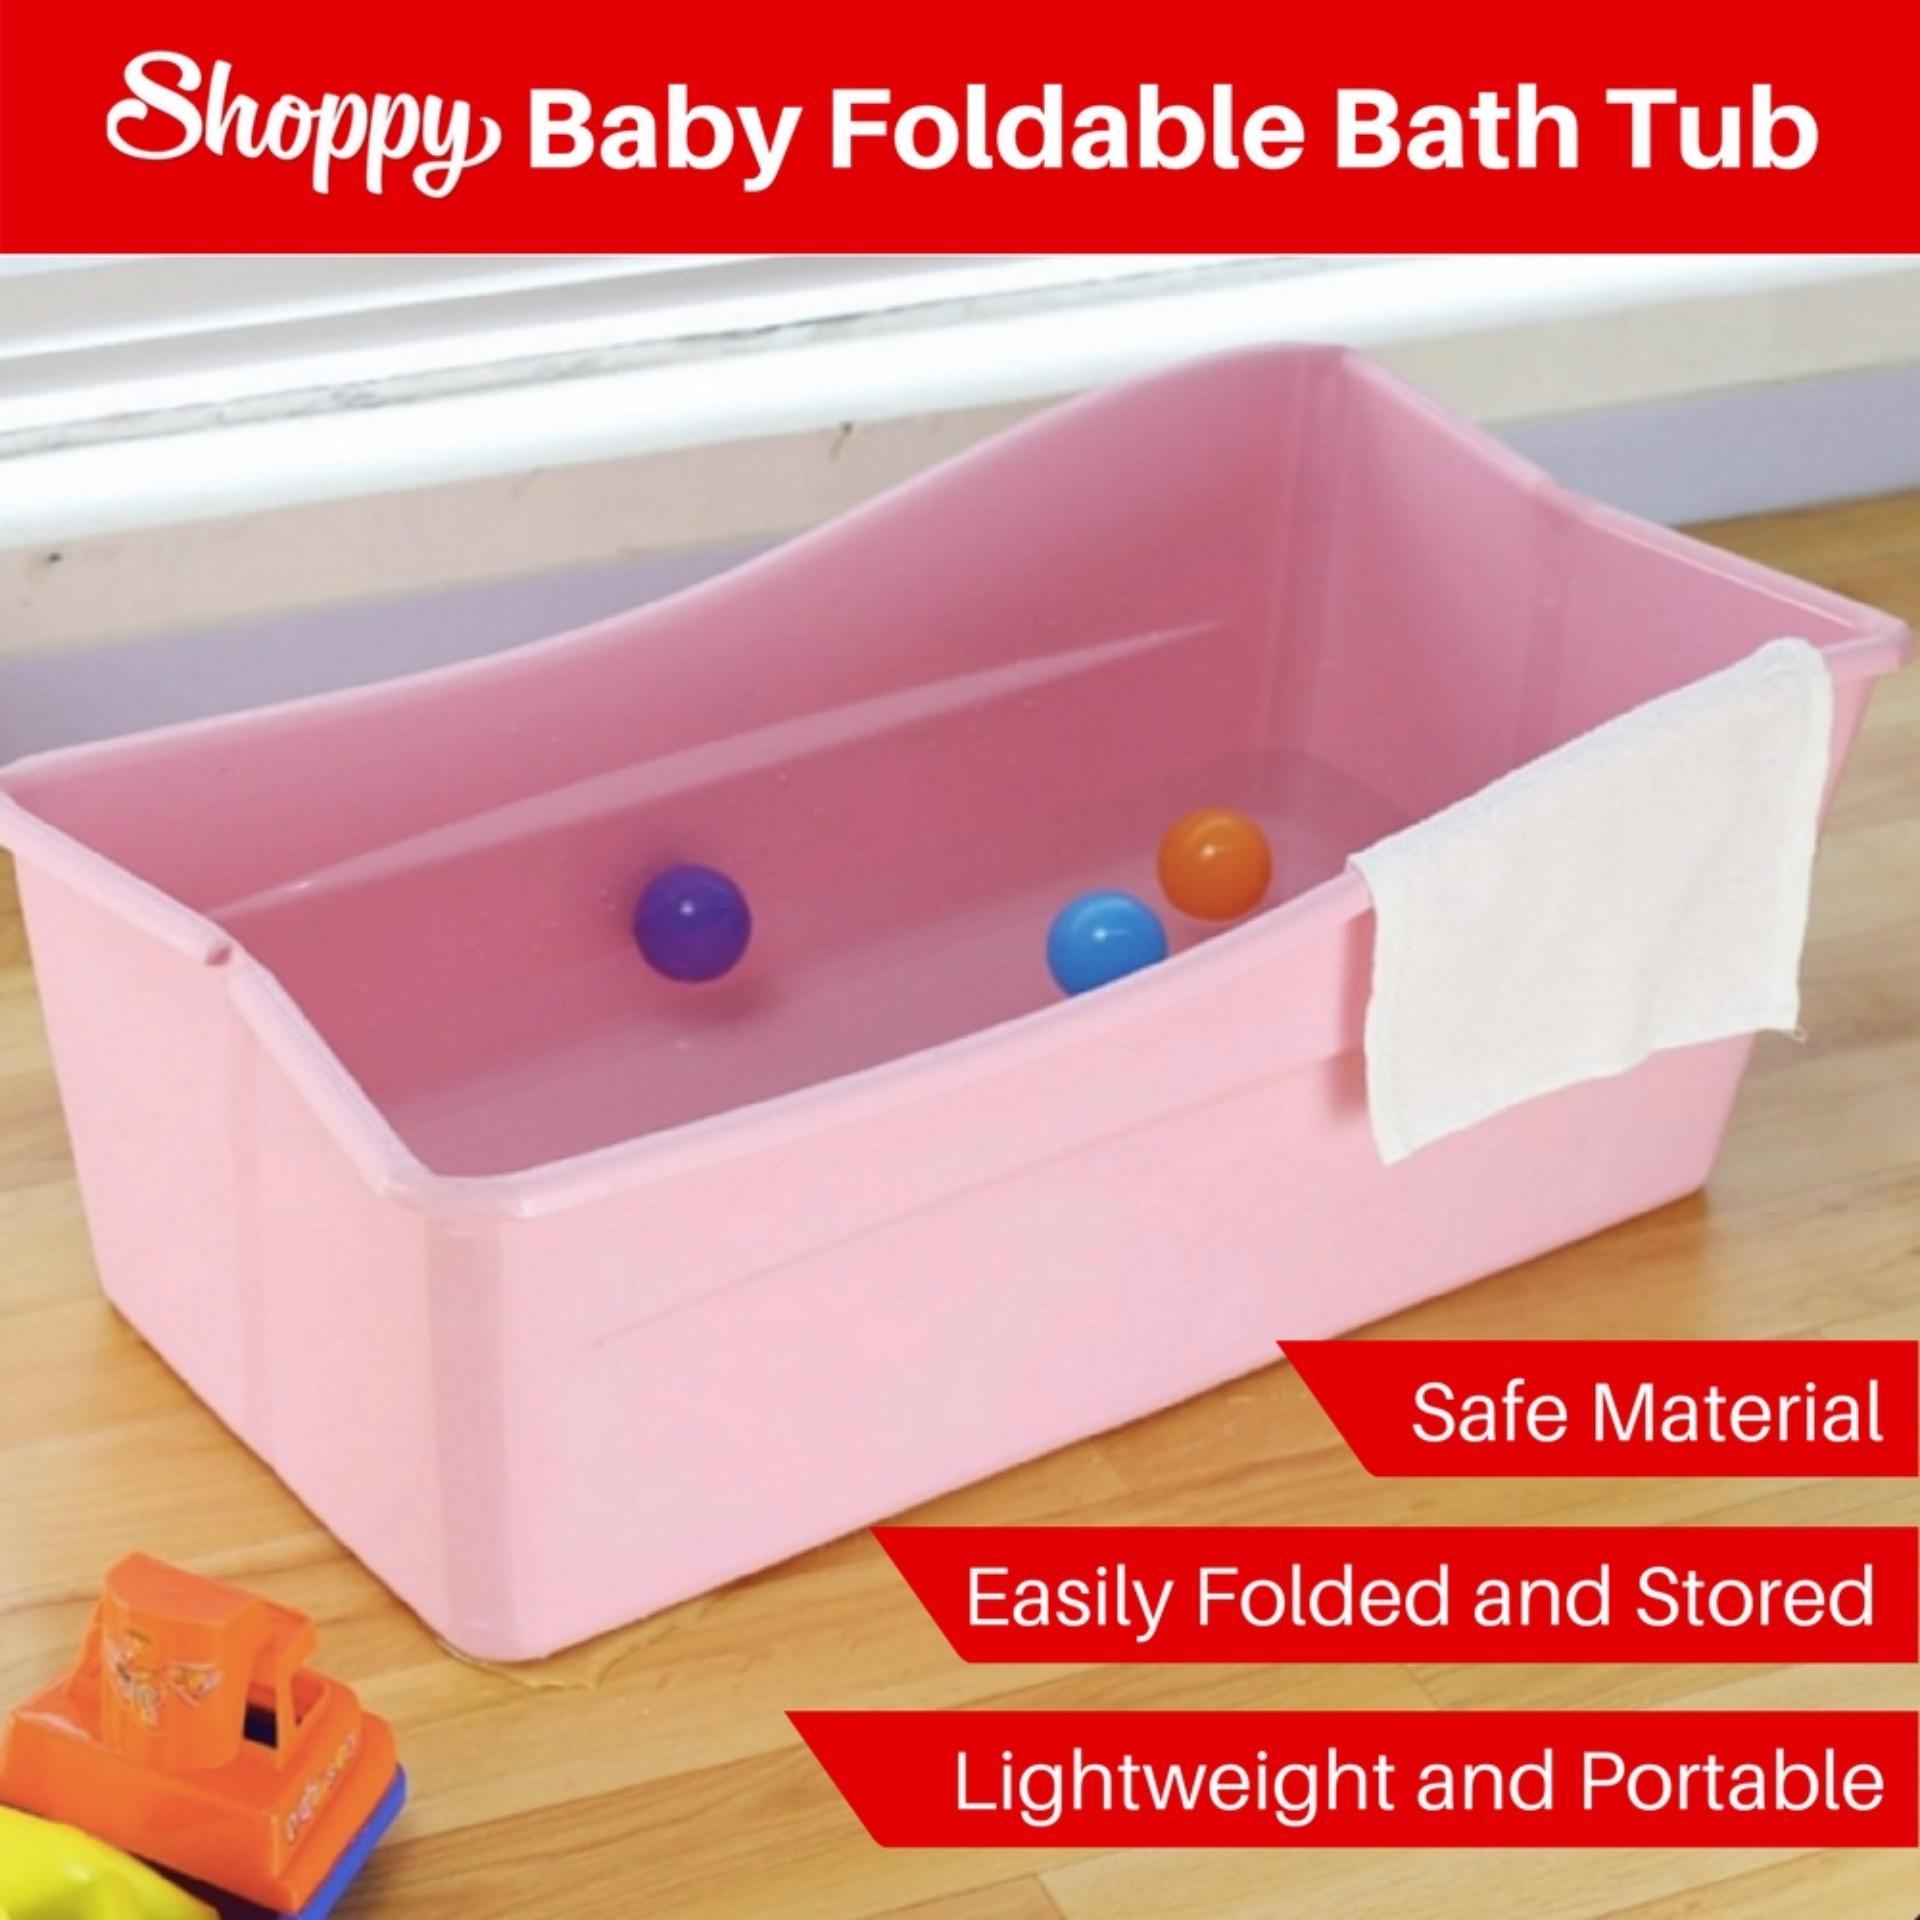 Shoppy Flexi Foldable Shower baby Bath Tub(Pink) Singapore